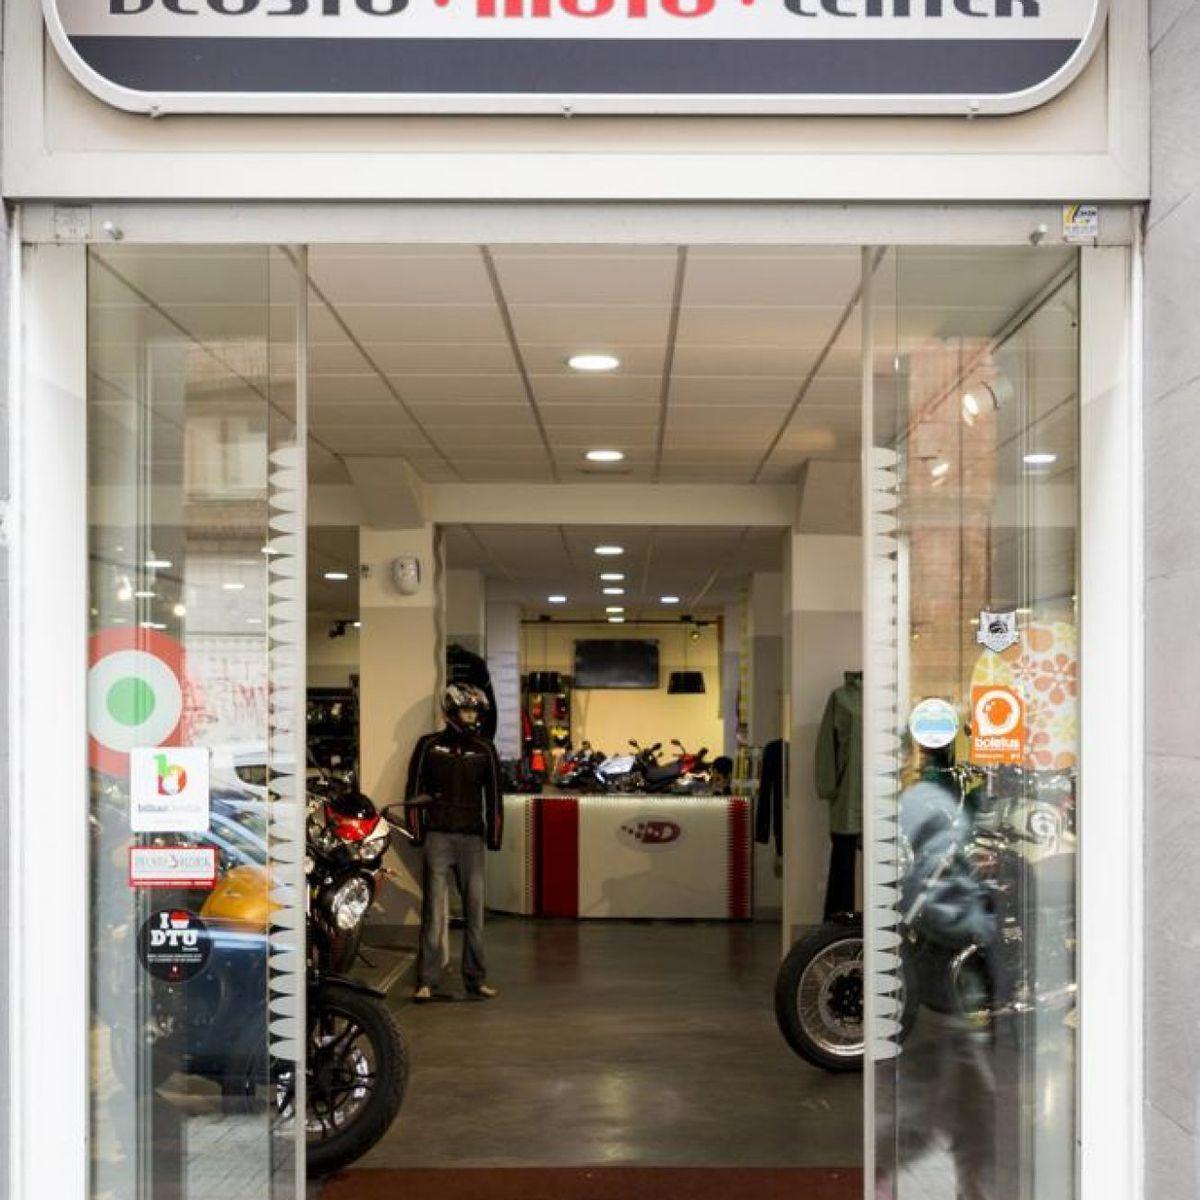 4088 deusto-moto-center 01